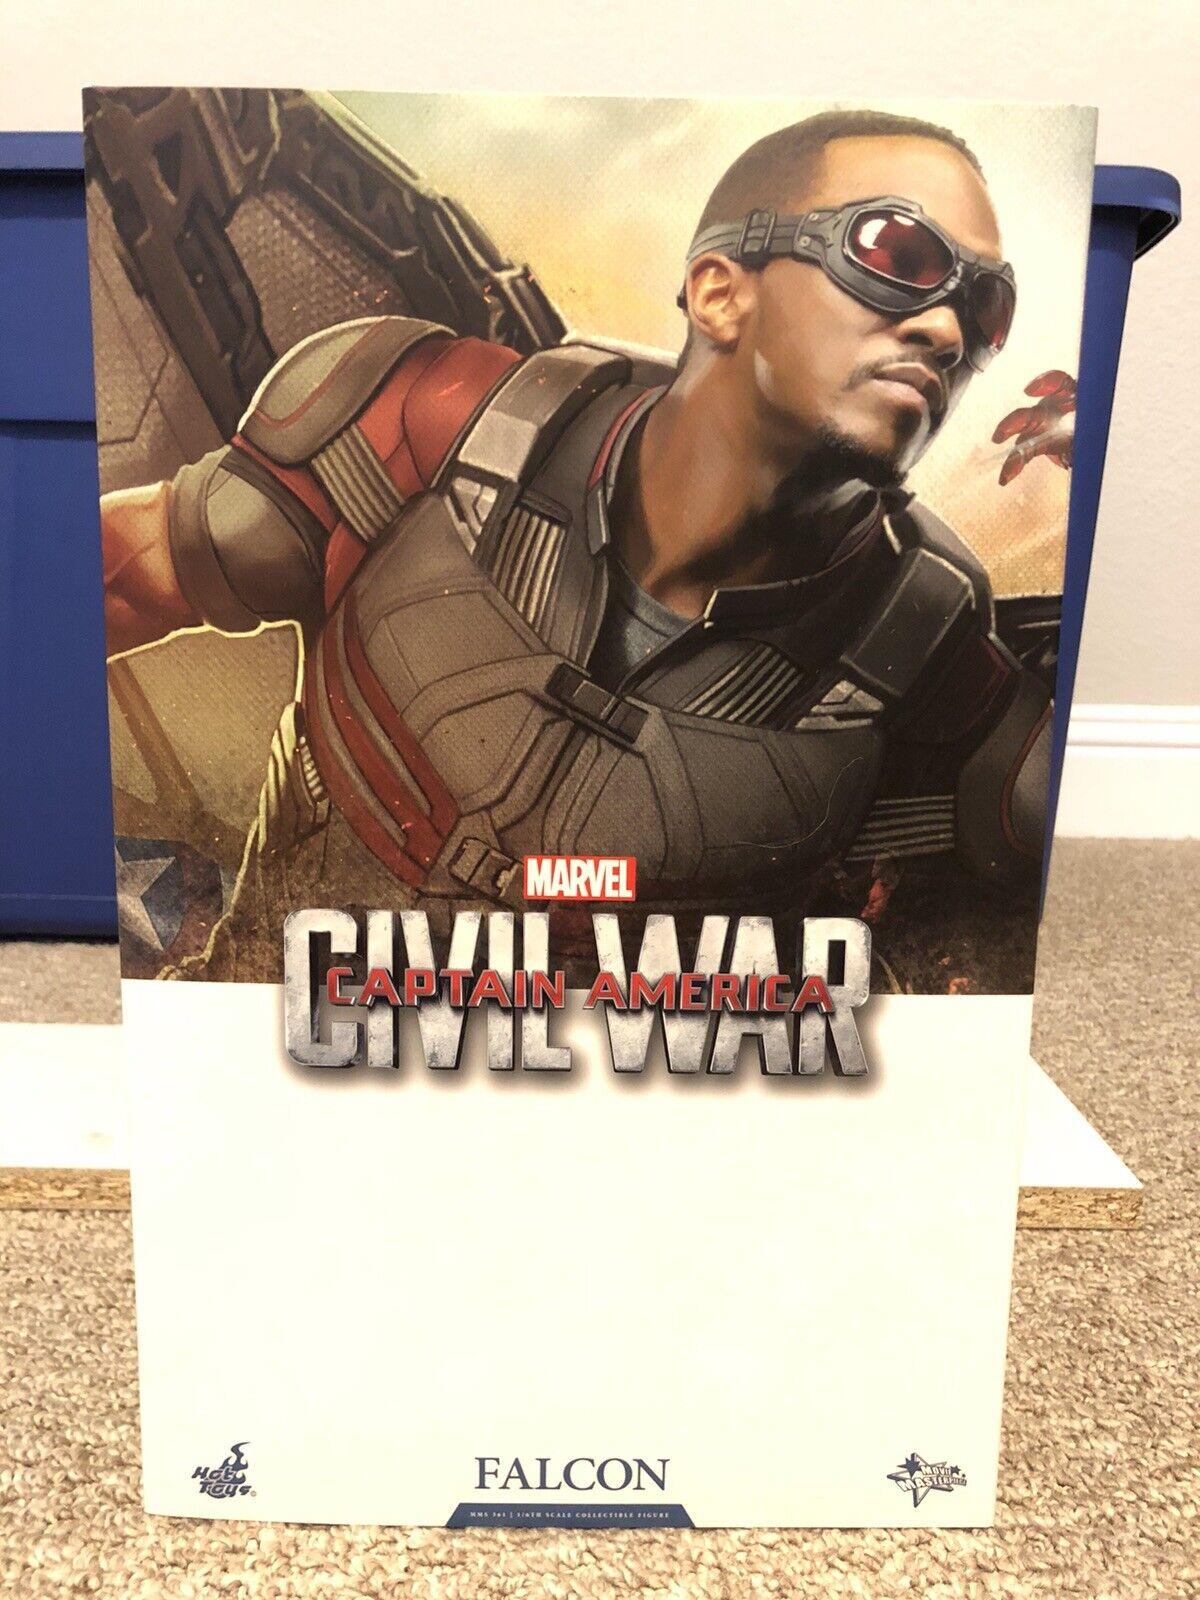 Hot Toys MMS361 Falcon Marvel Captain America Civil War 1/6 Figure on eBay thumbnail